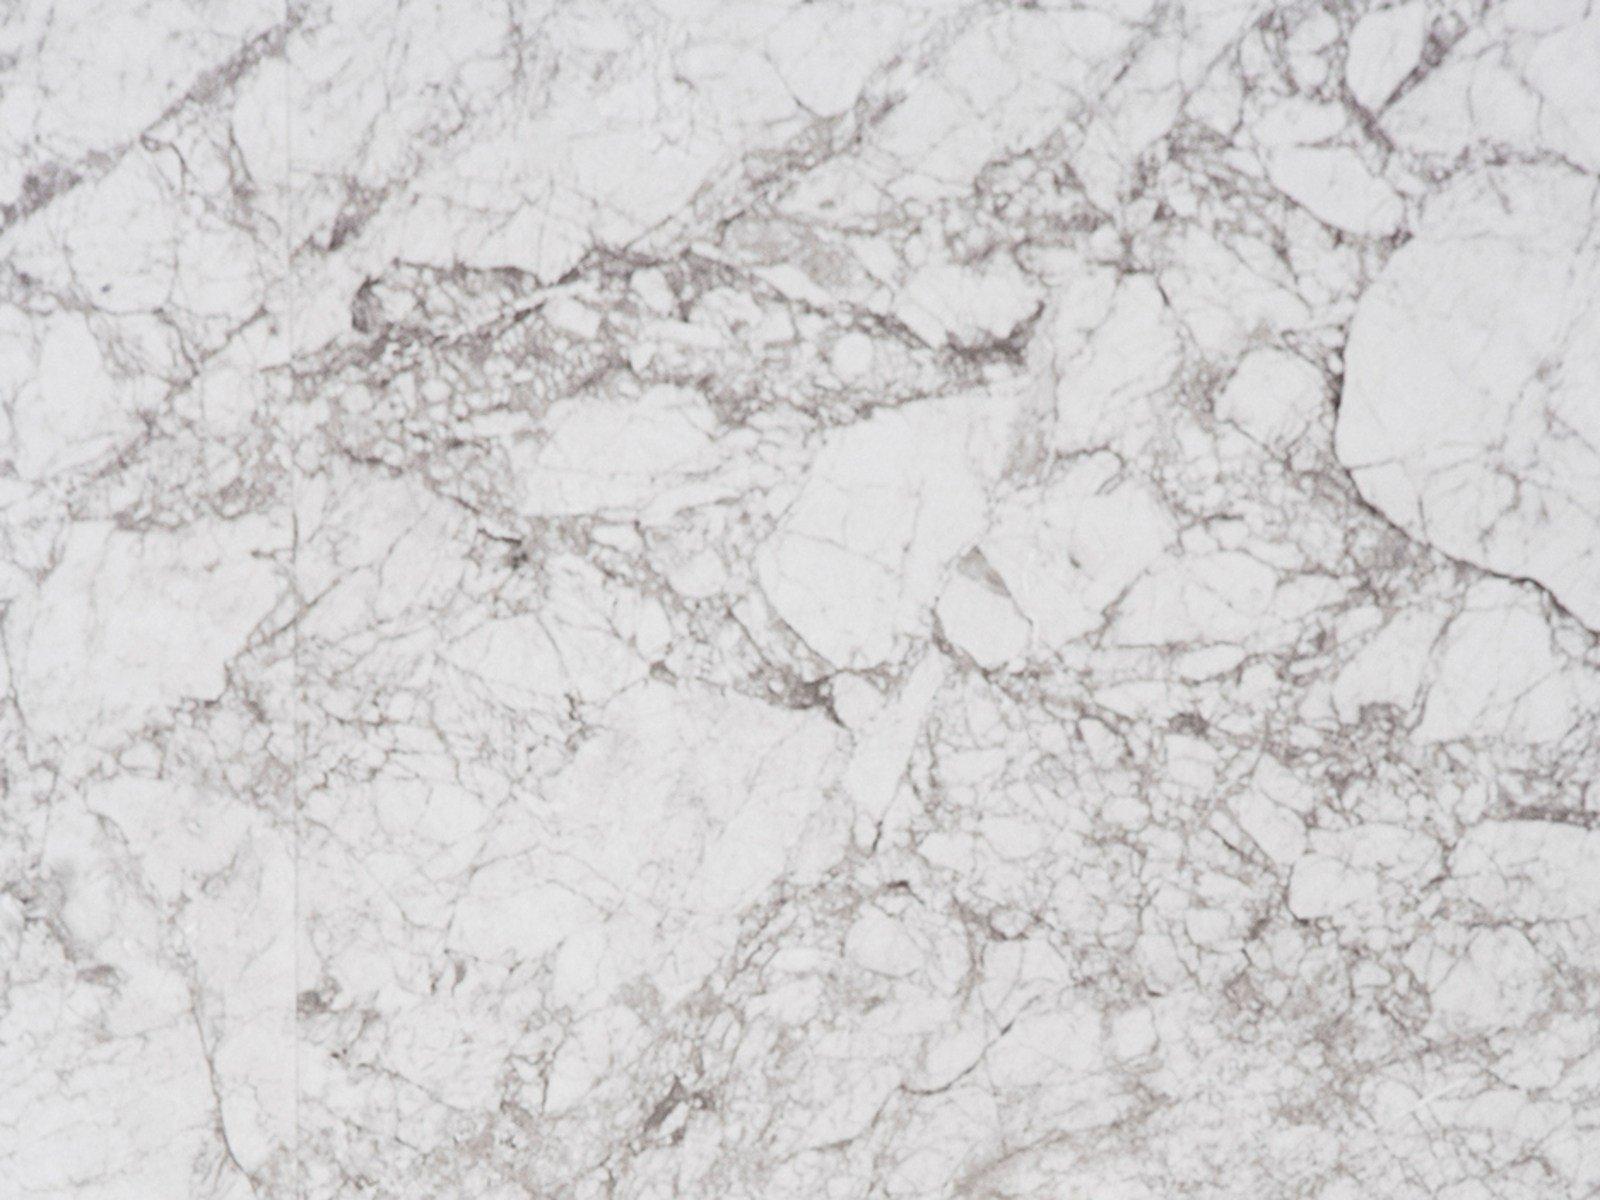 White Marble Wallpaper : White stone wallpaper wallpapersafari